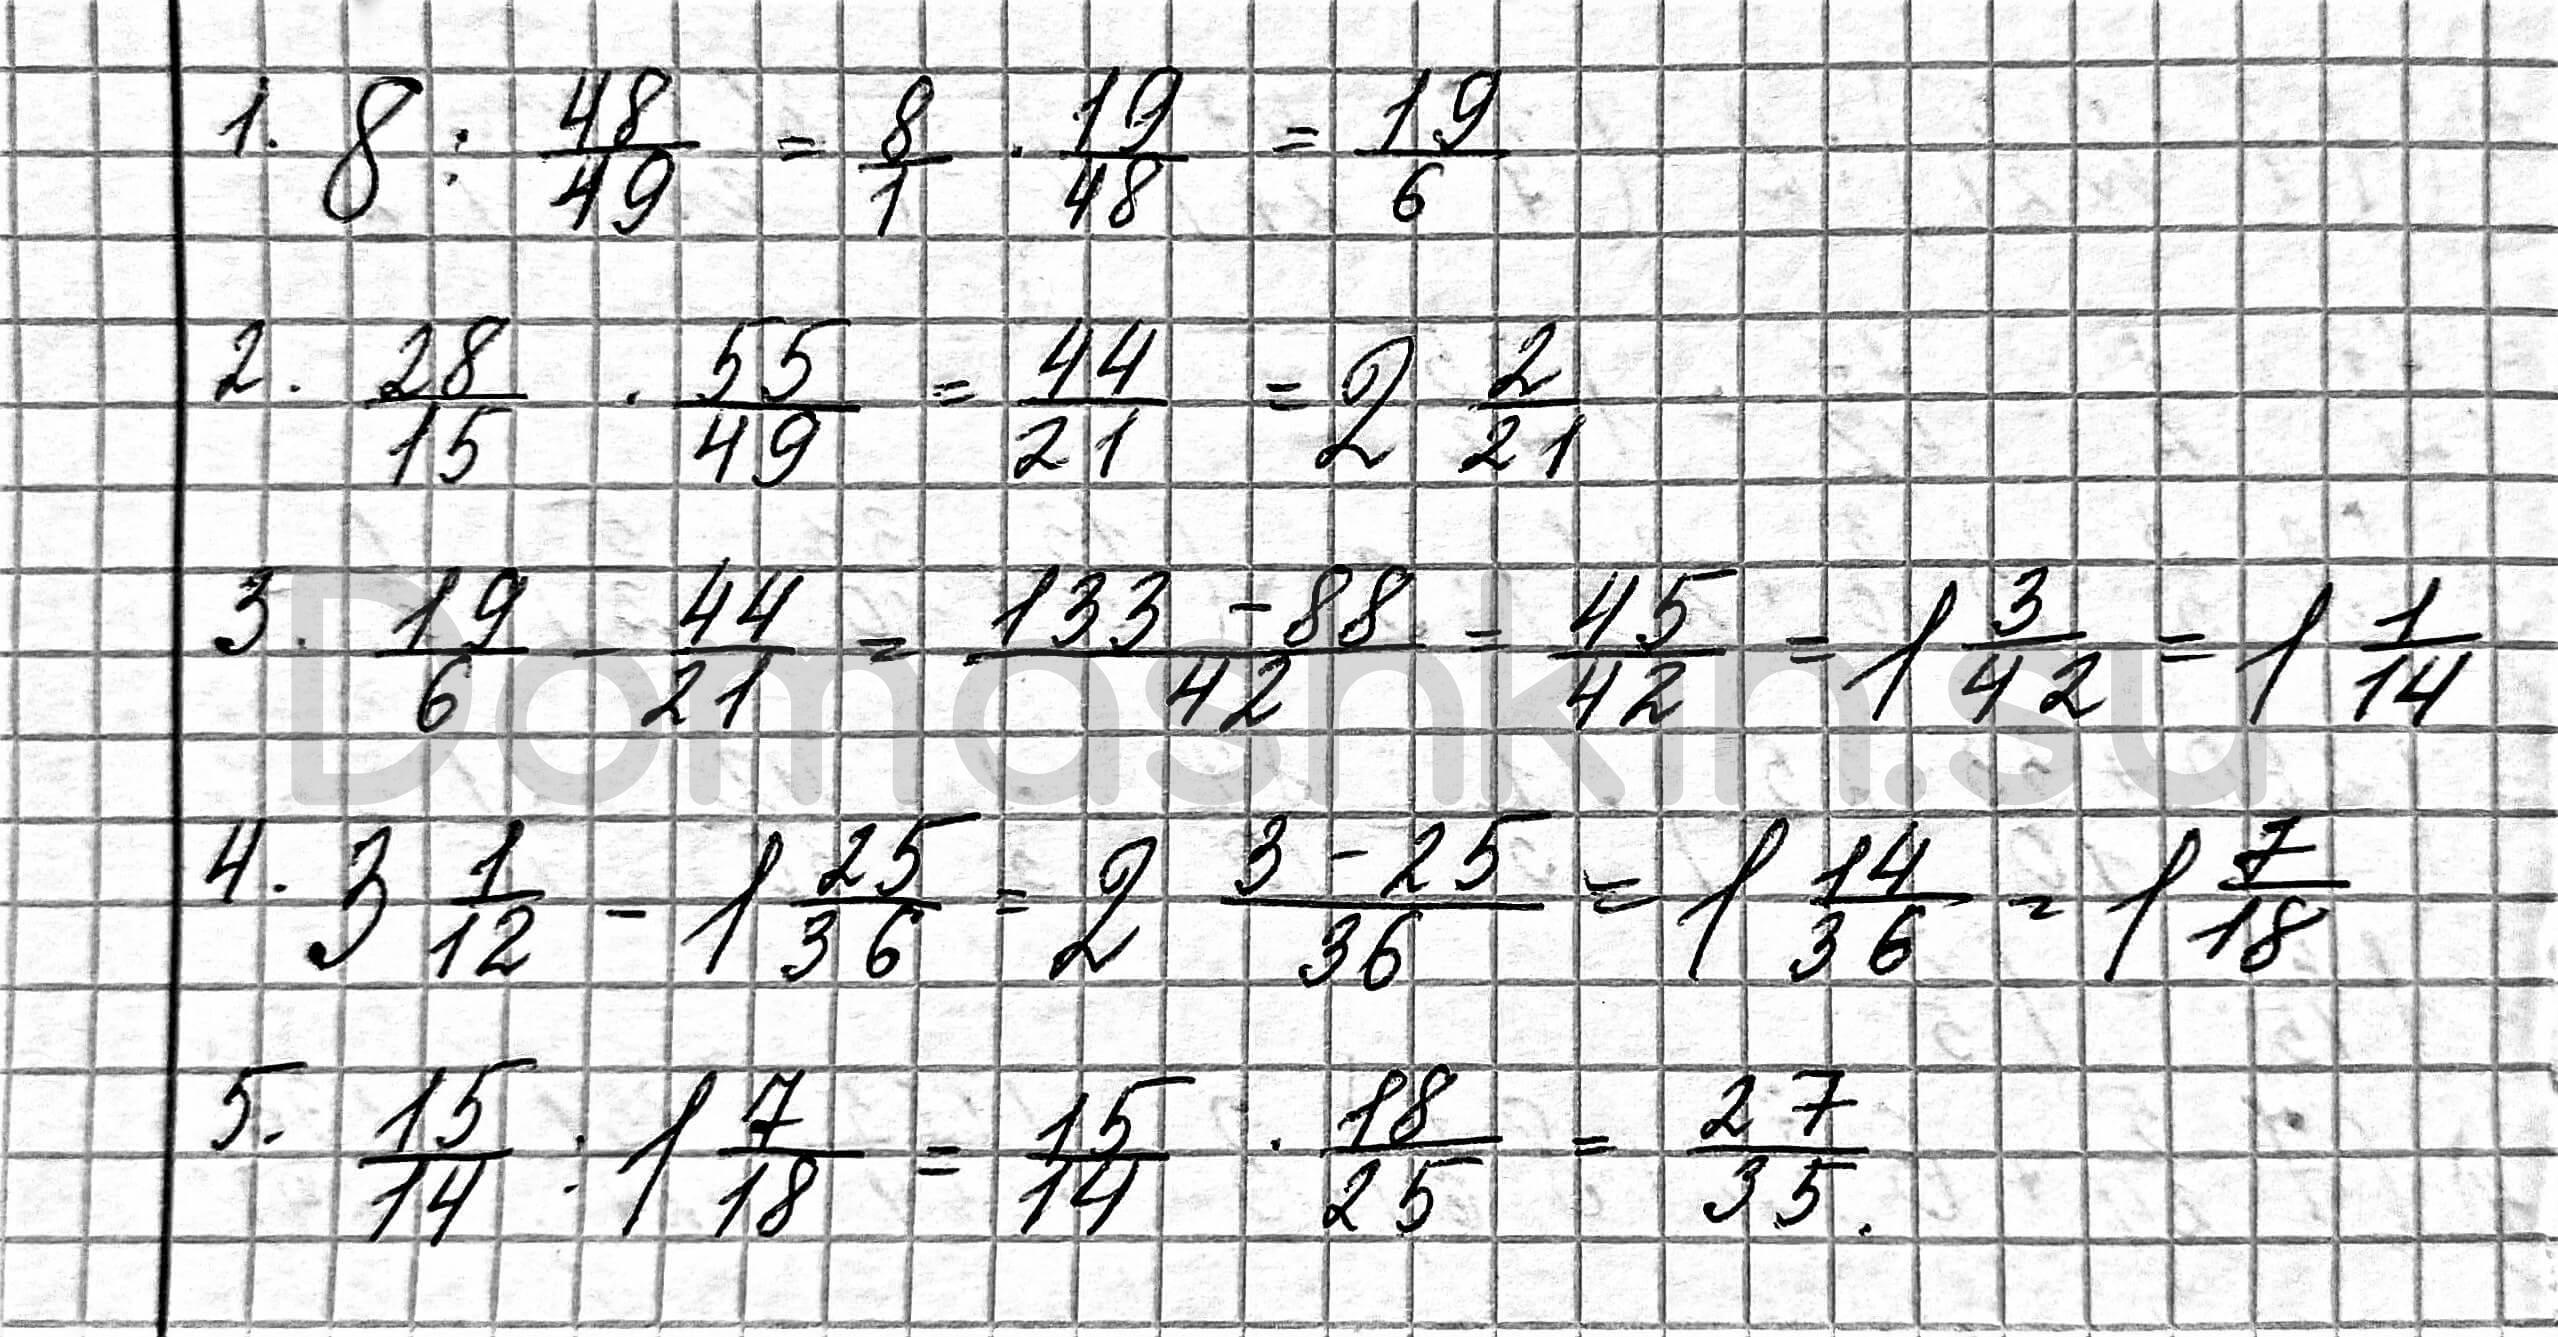 Математика 6 класс учебник Мерзляк номер 461 решение